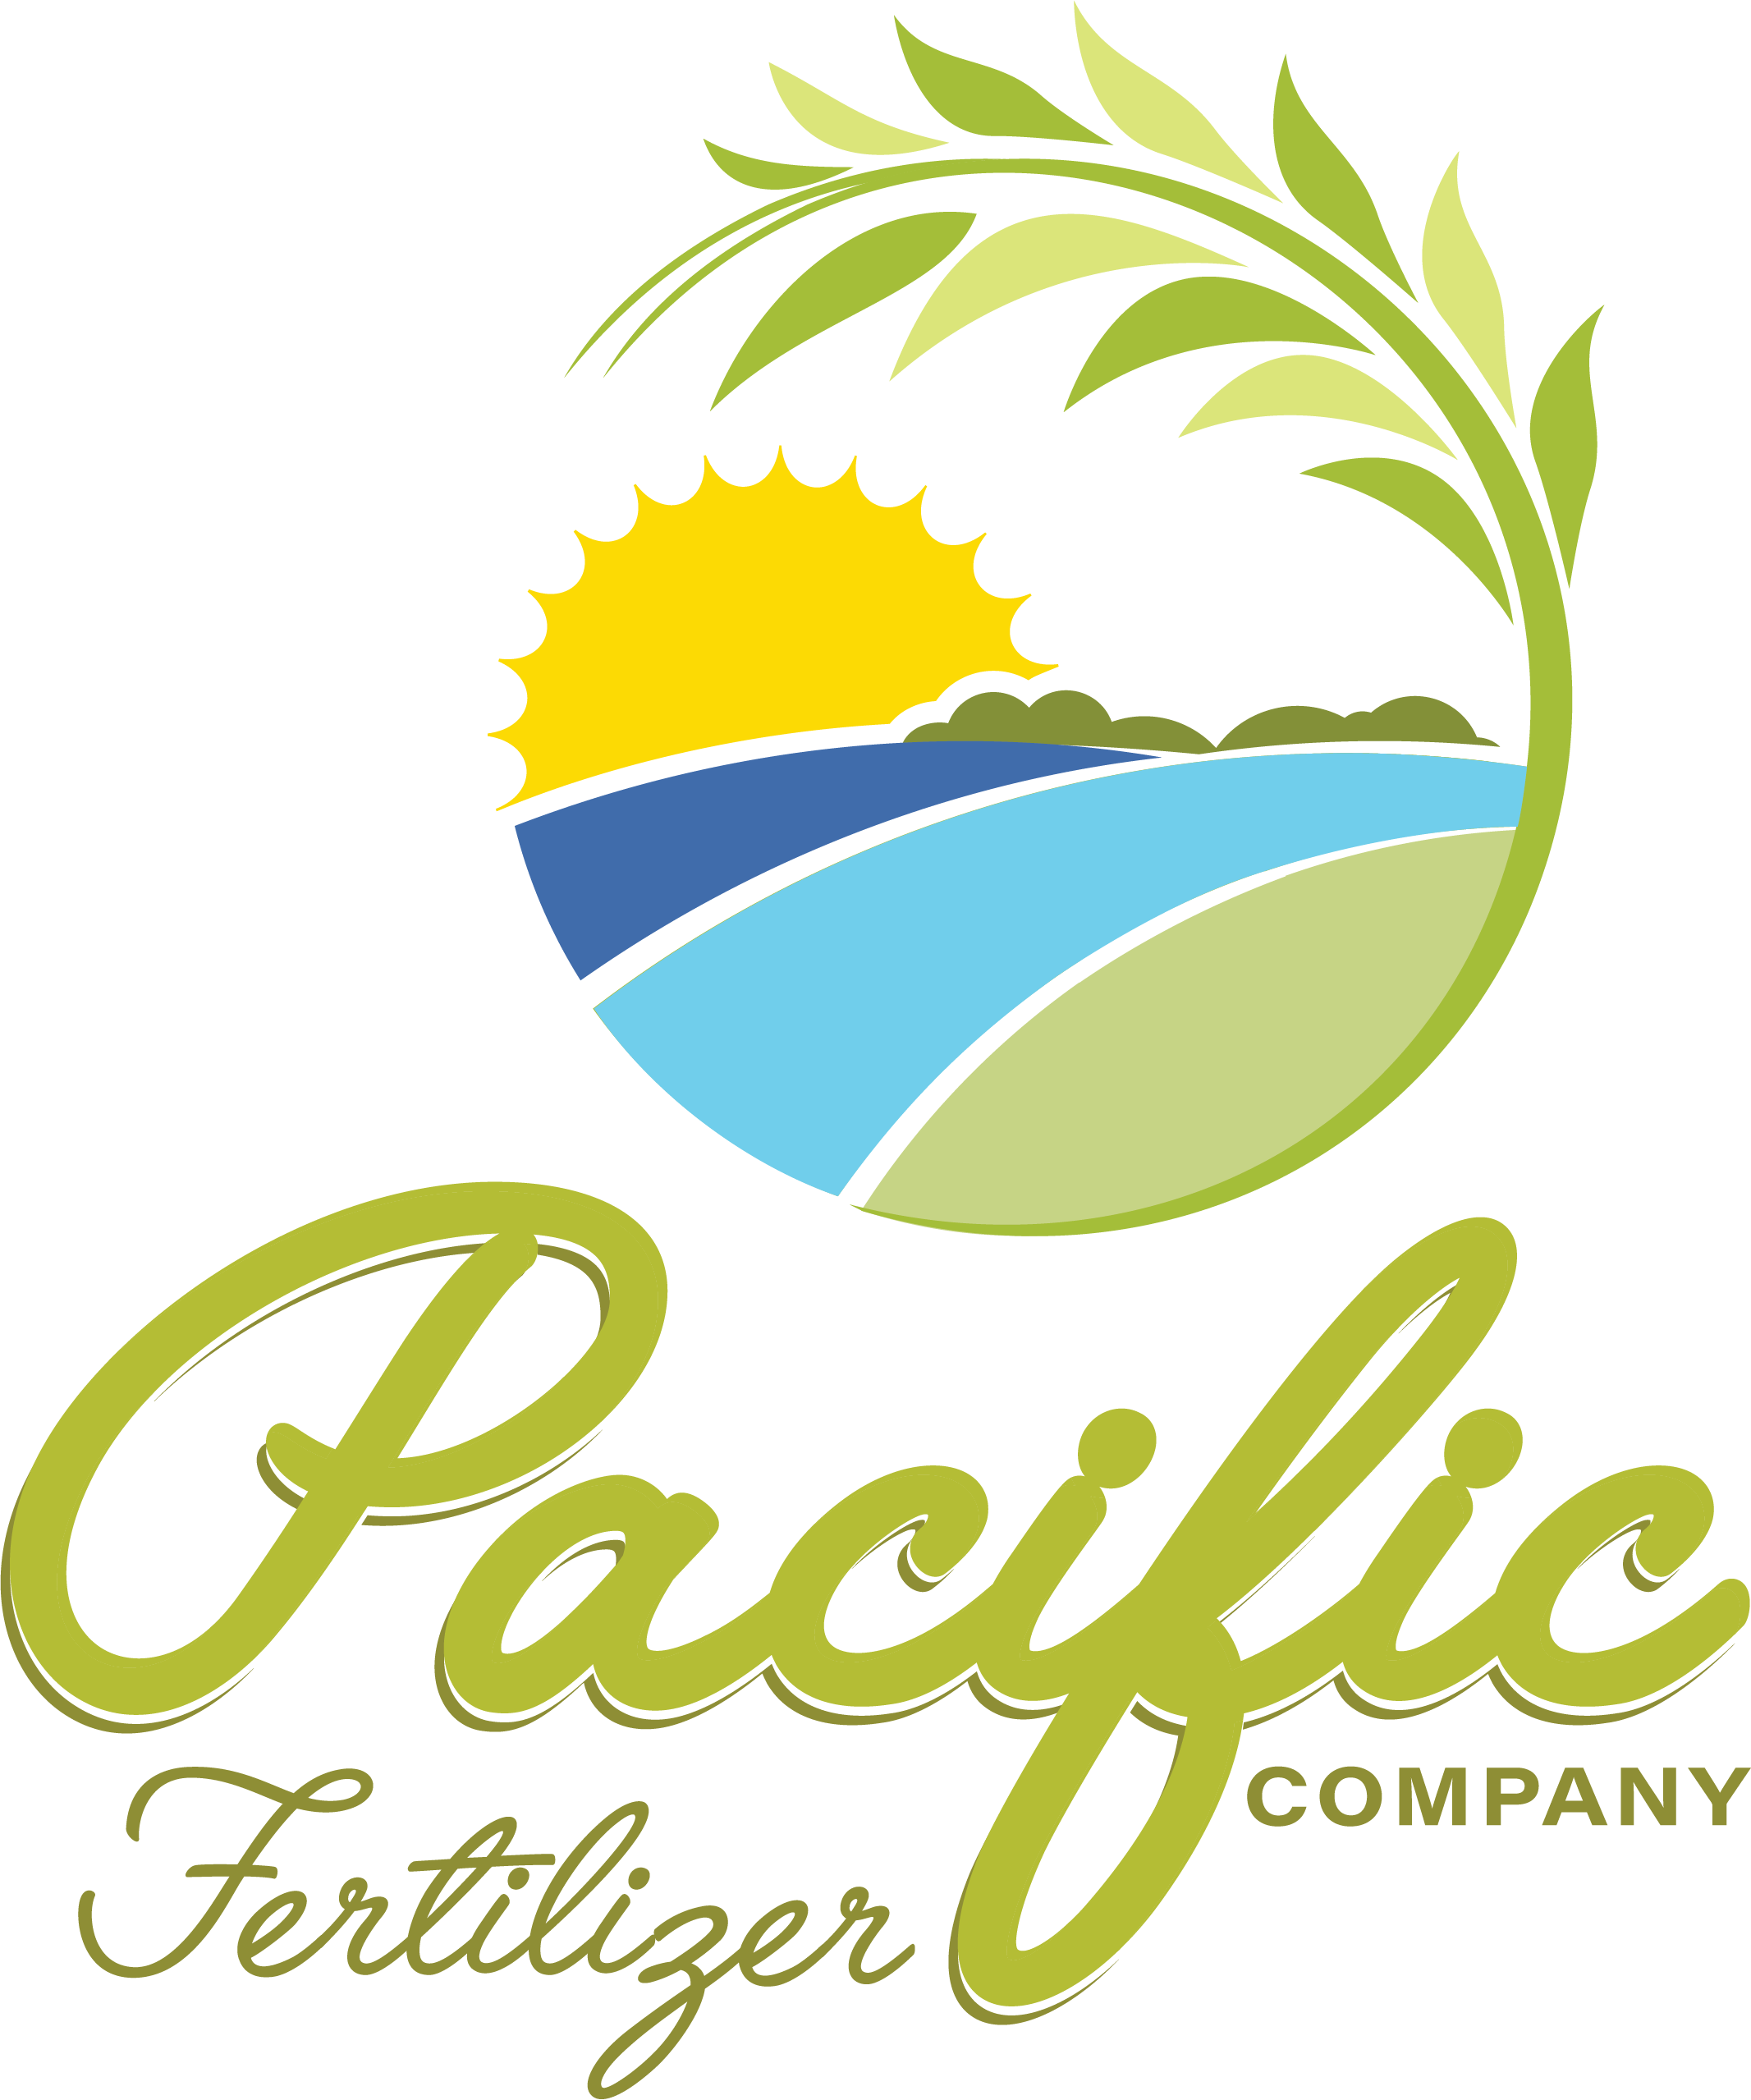 Home pacific fertilizer company. Gardener clipart agronomist